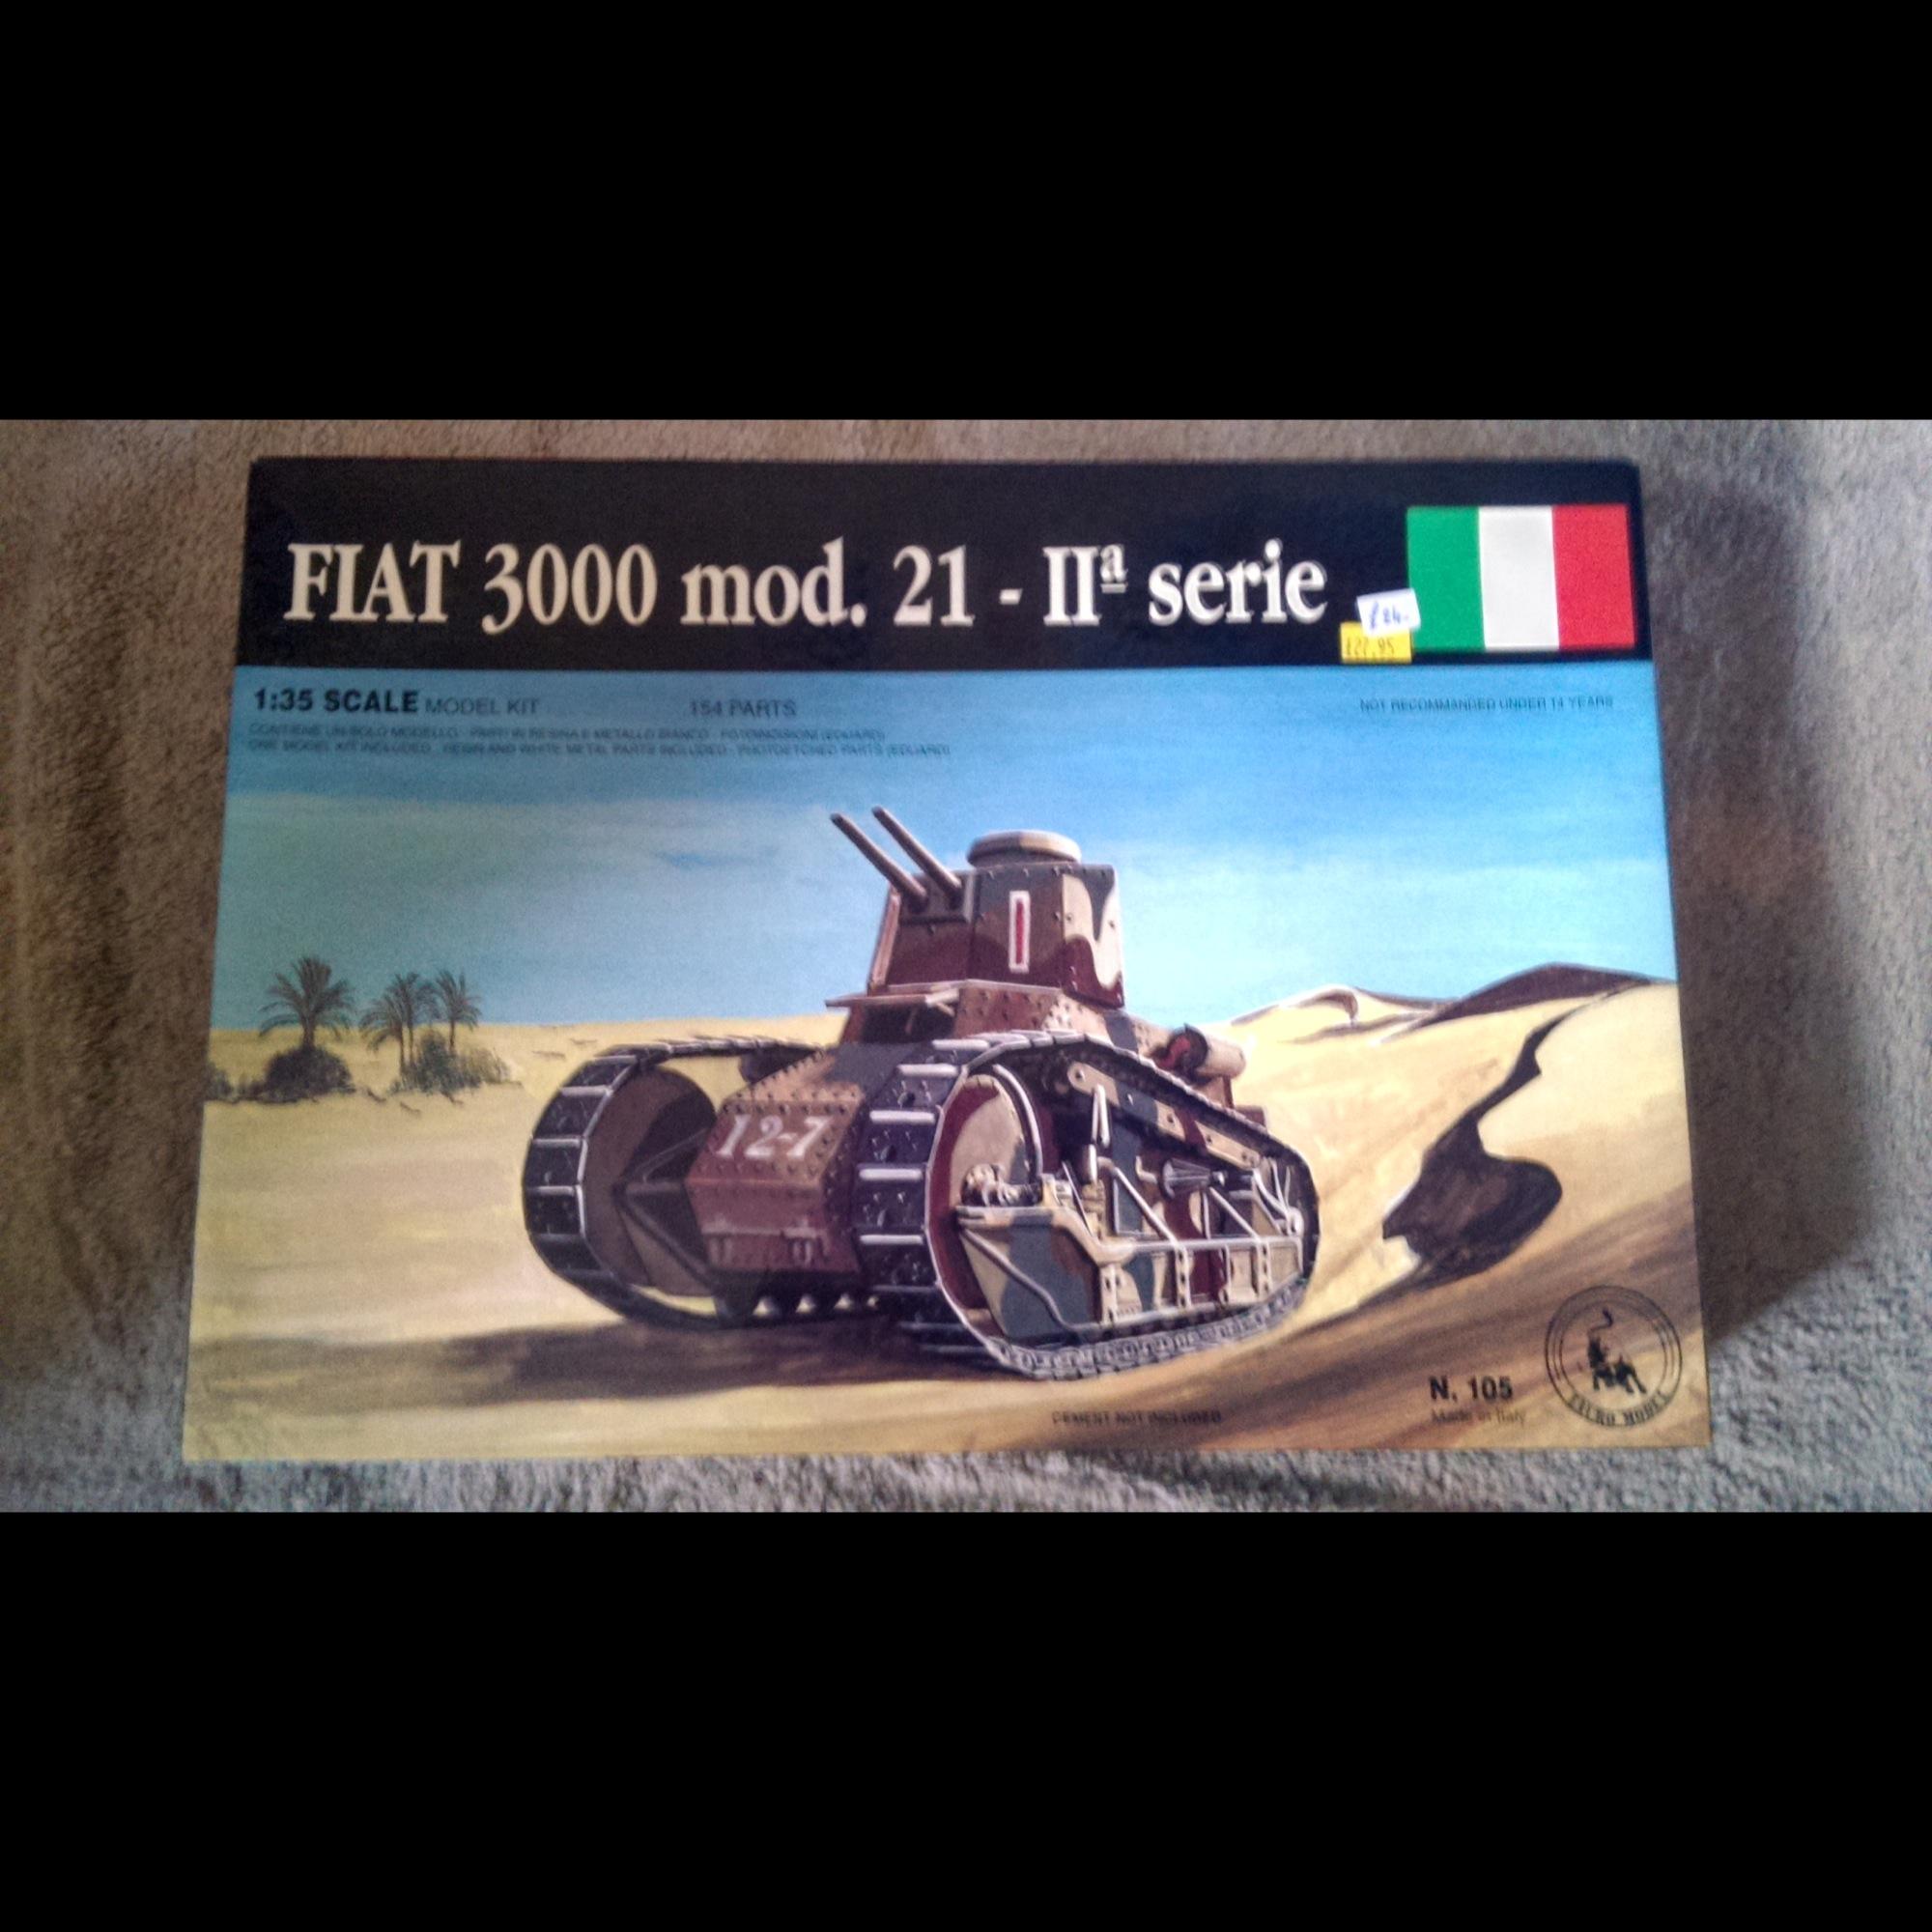 Fiat 3000 mod. 21 IIa Serie